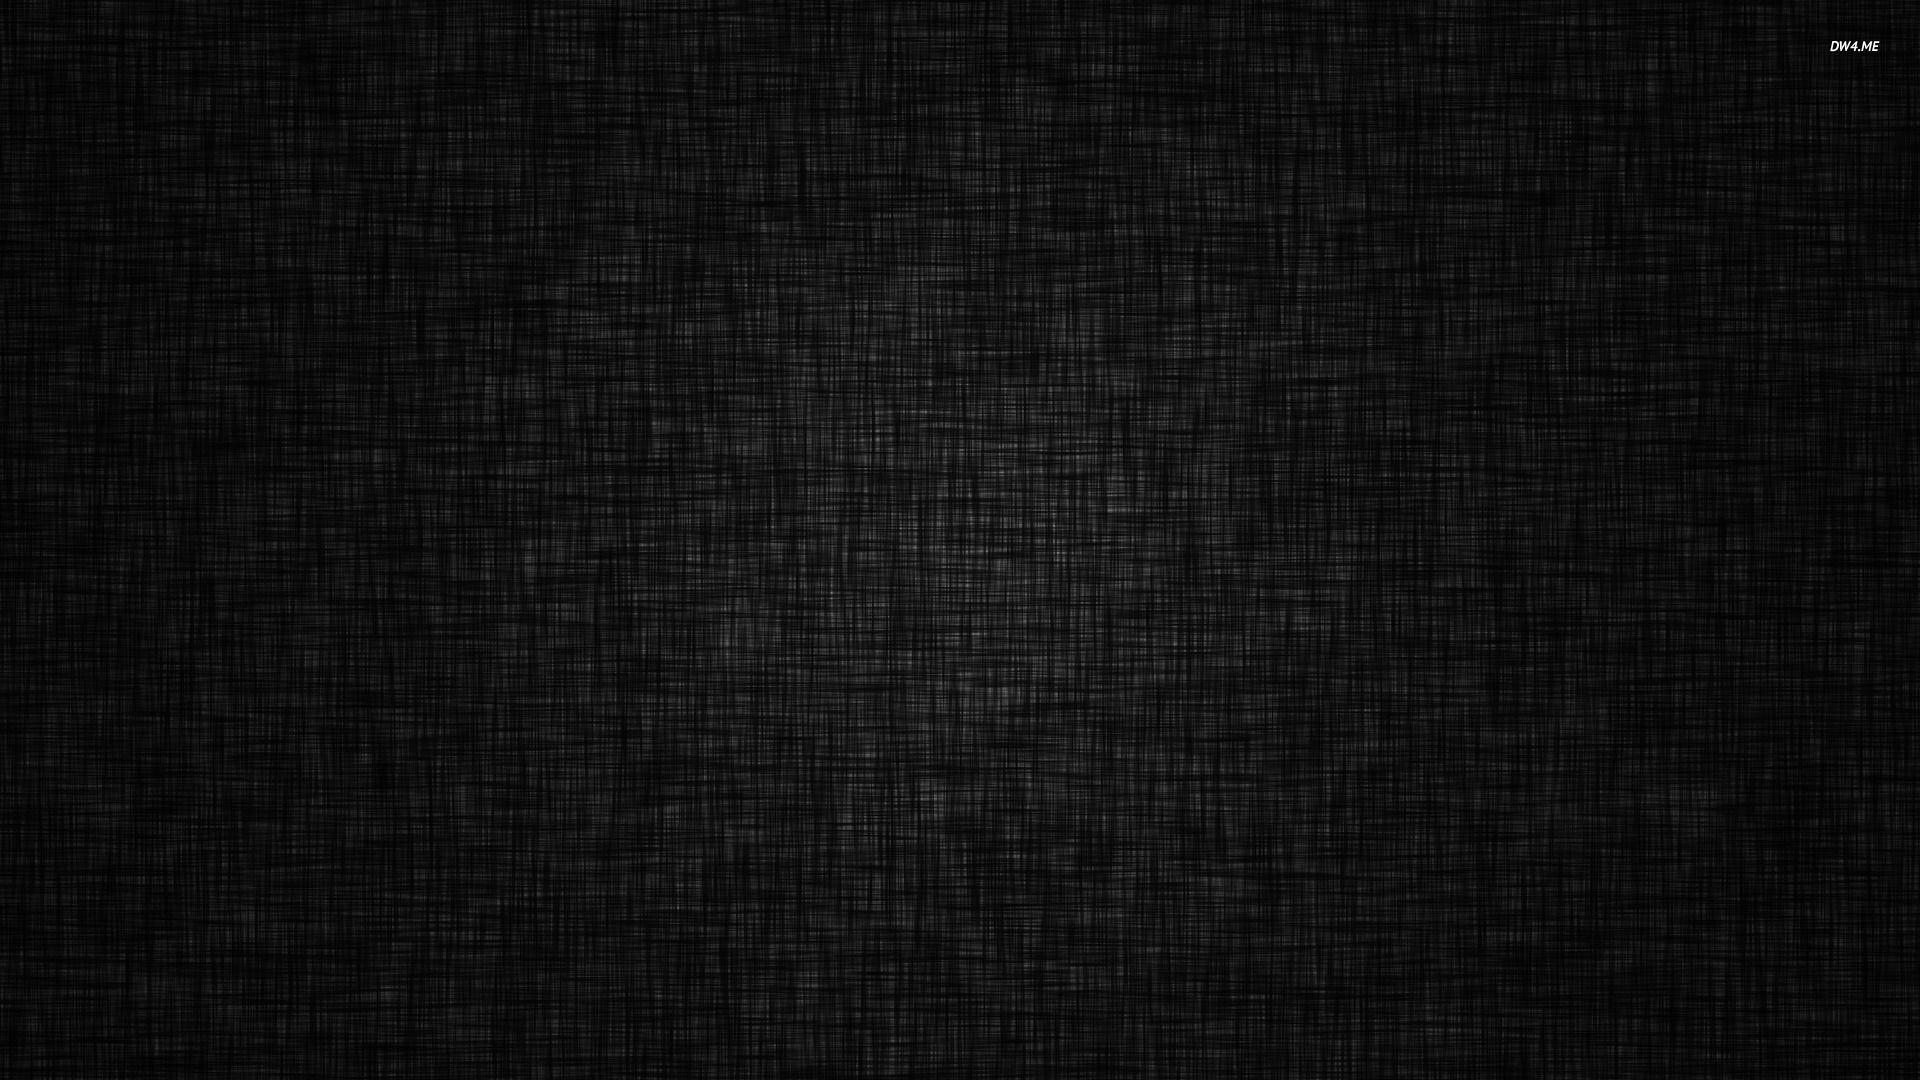 Black Wood Wallpaper Black Texture Wallpaper 183 ① Download Free Cool High